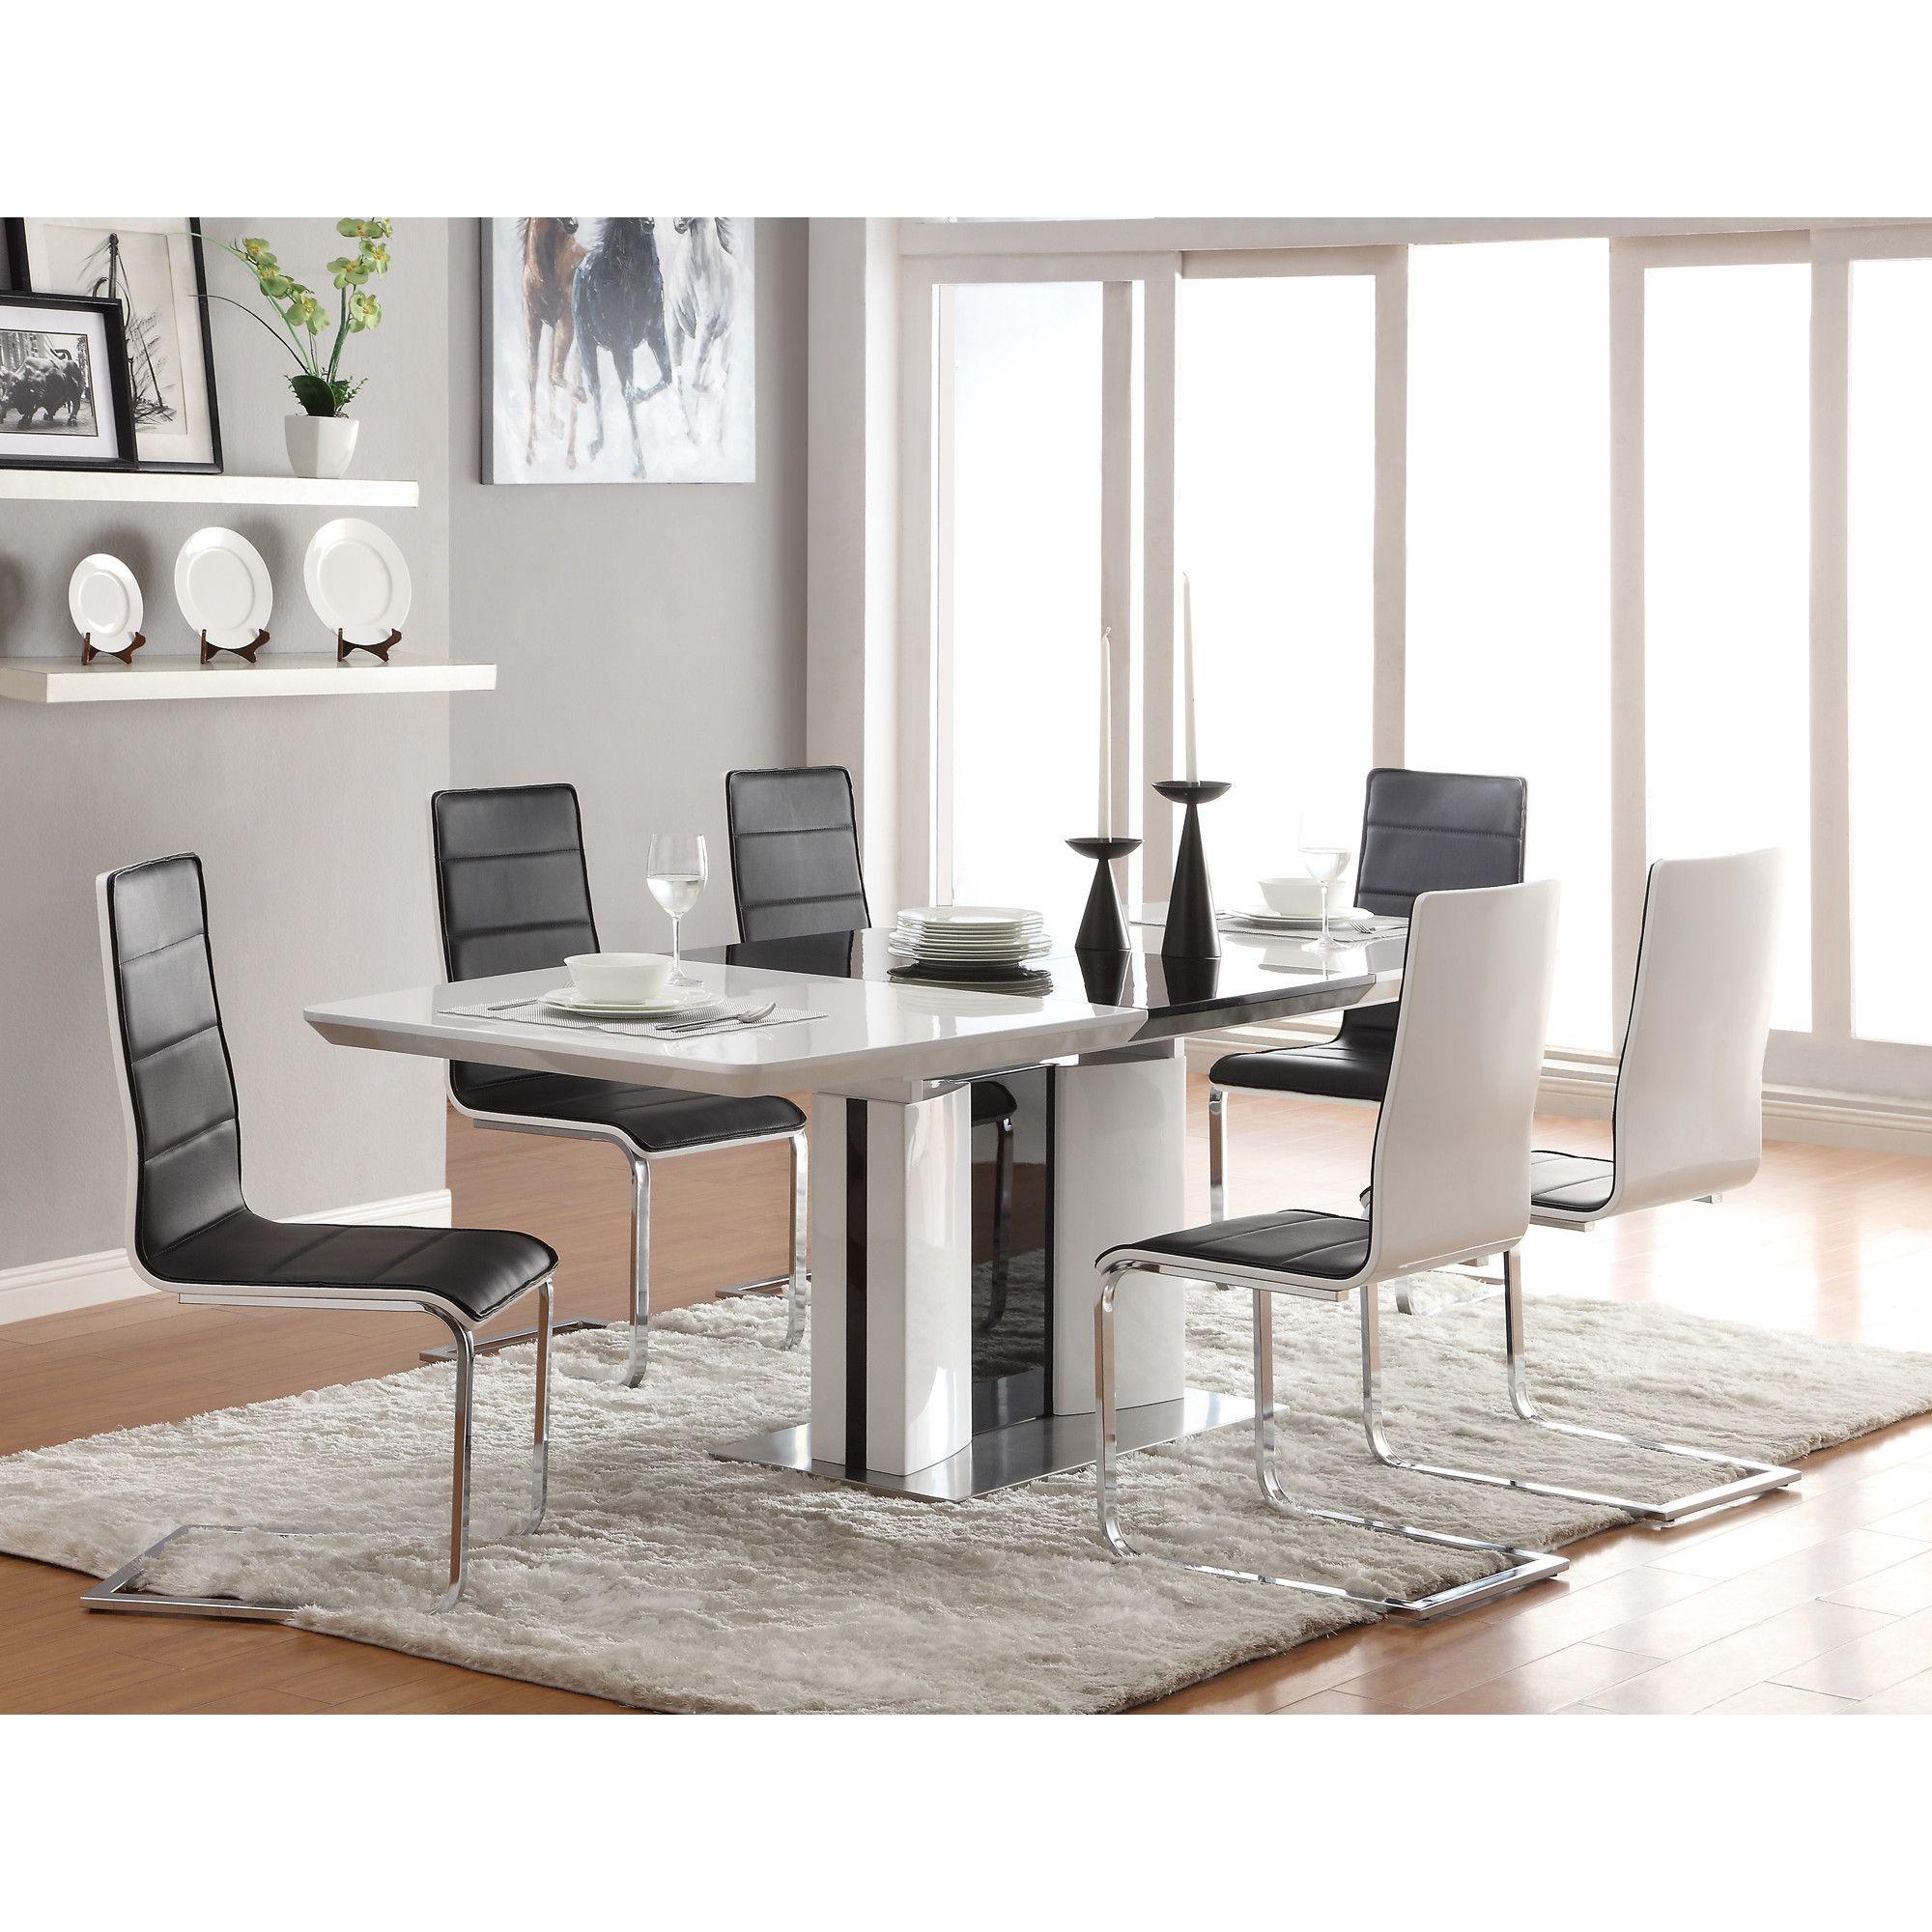 Inspiring Logan Dining Room Set Contemporary - Exterior ideas 3D ...